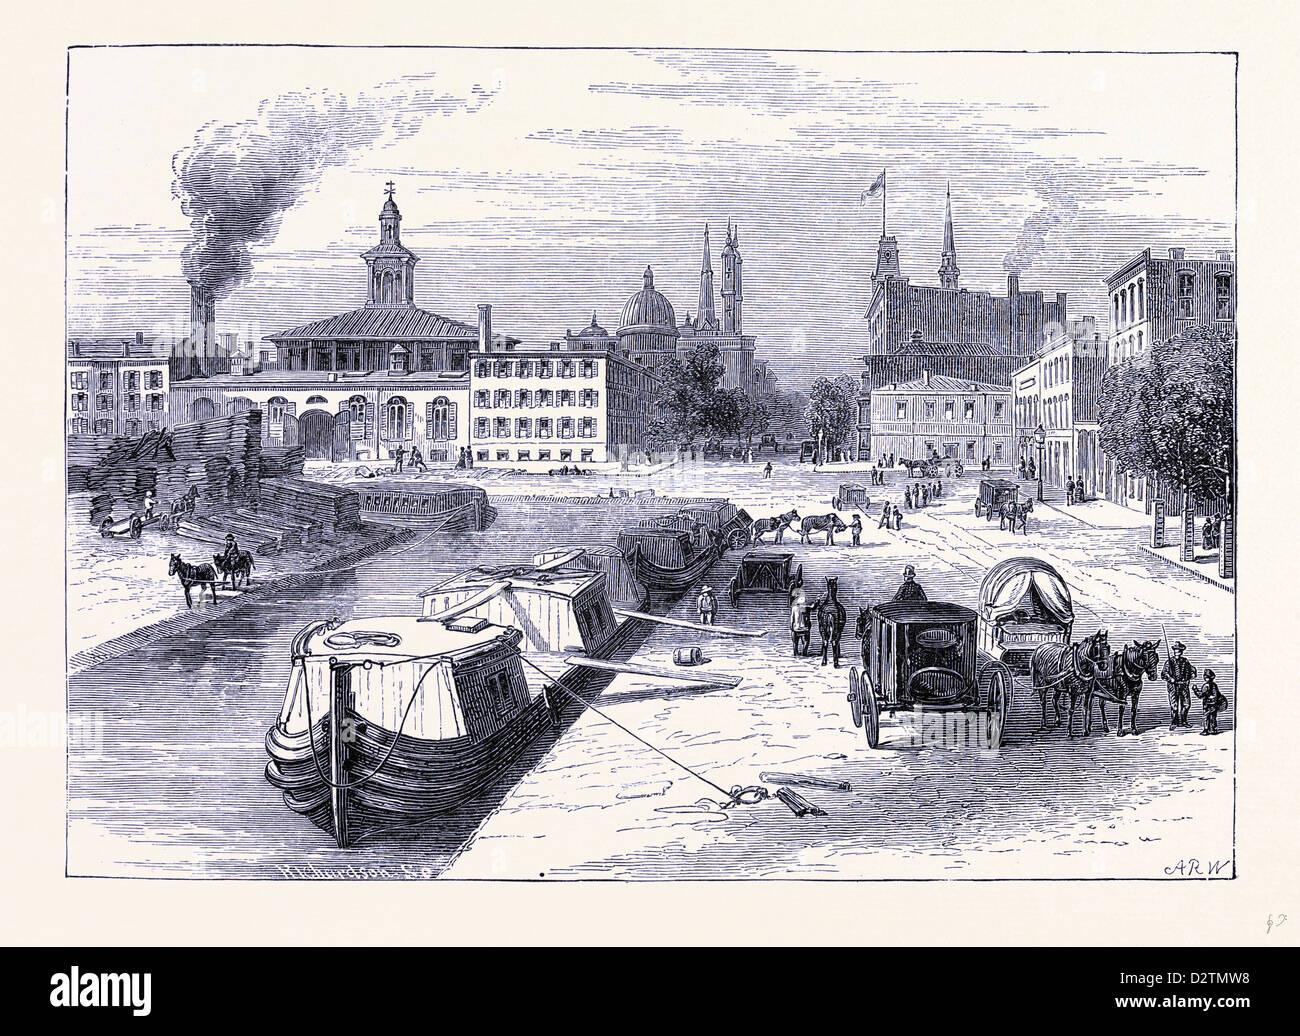 Rheine United States of America - Stock Image